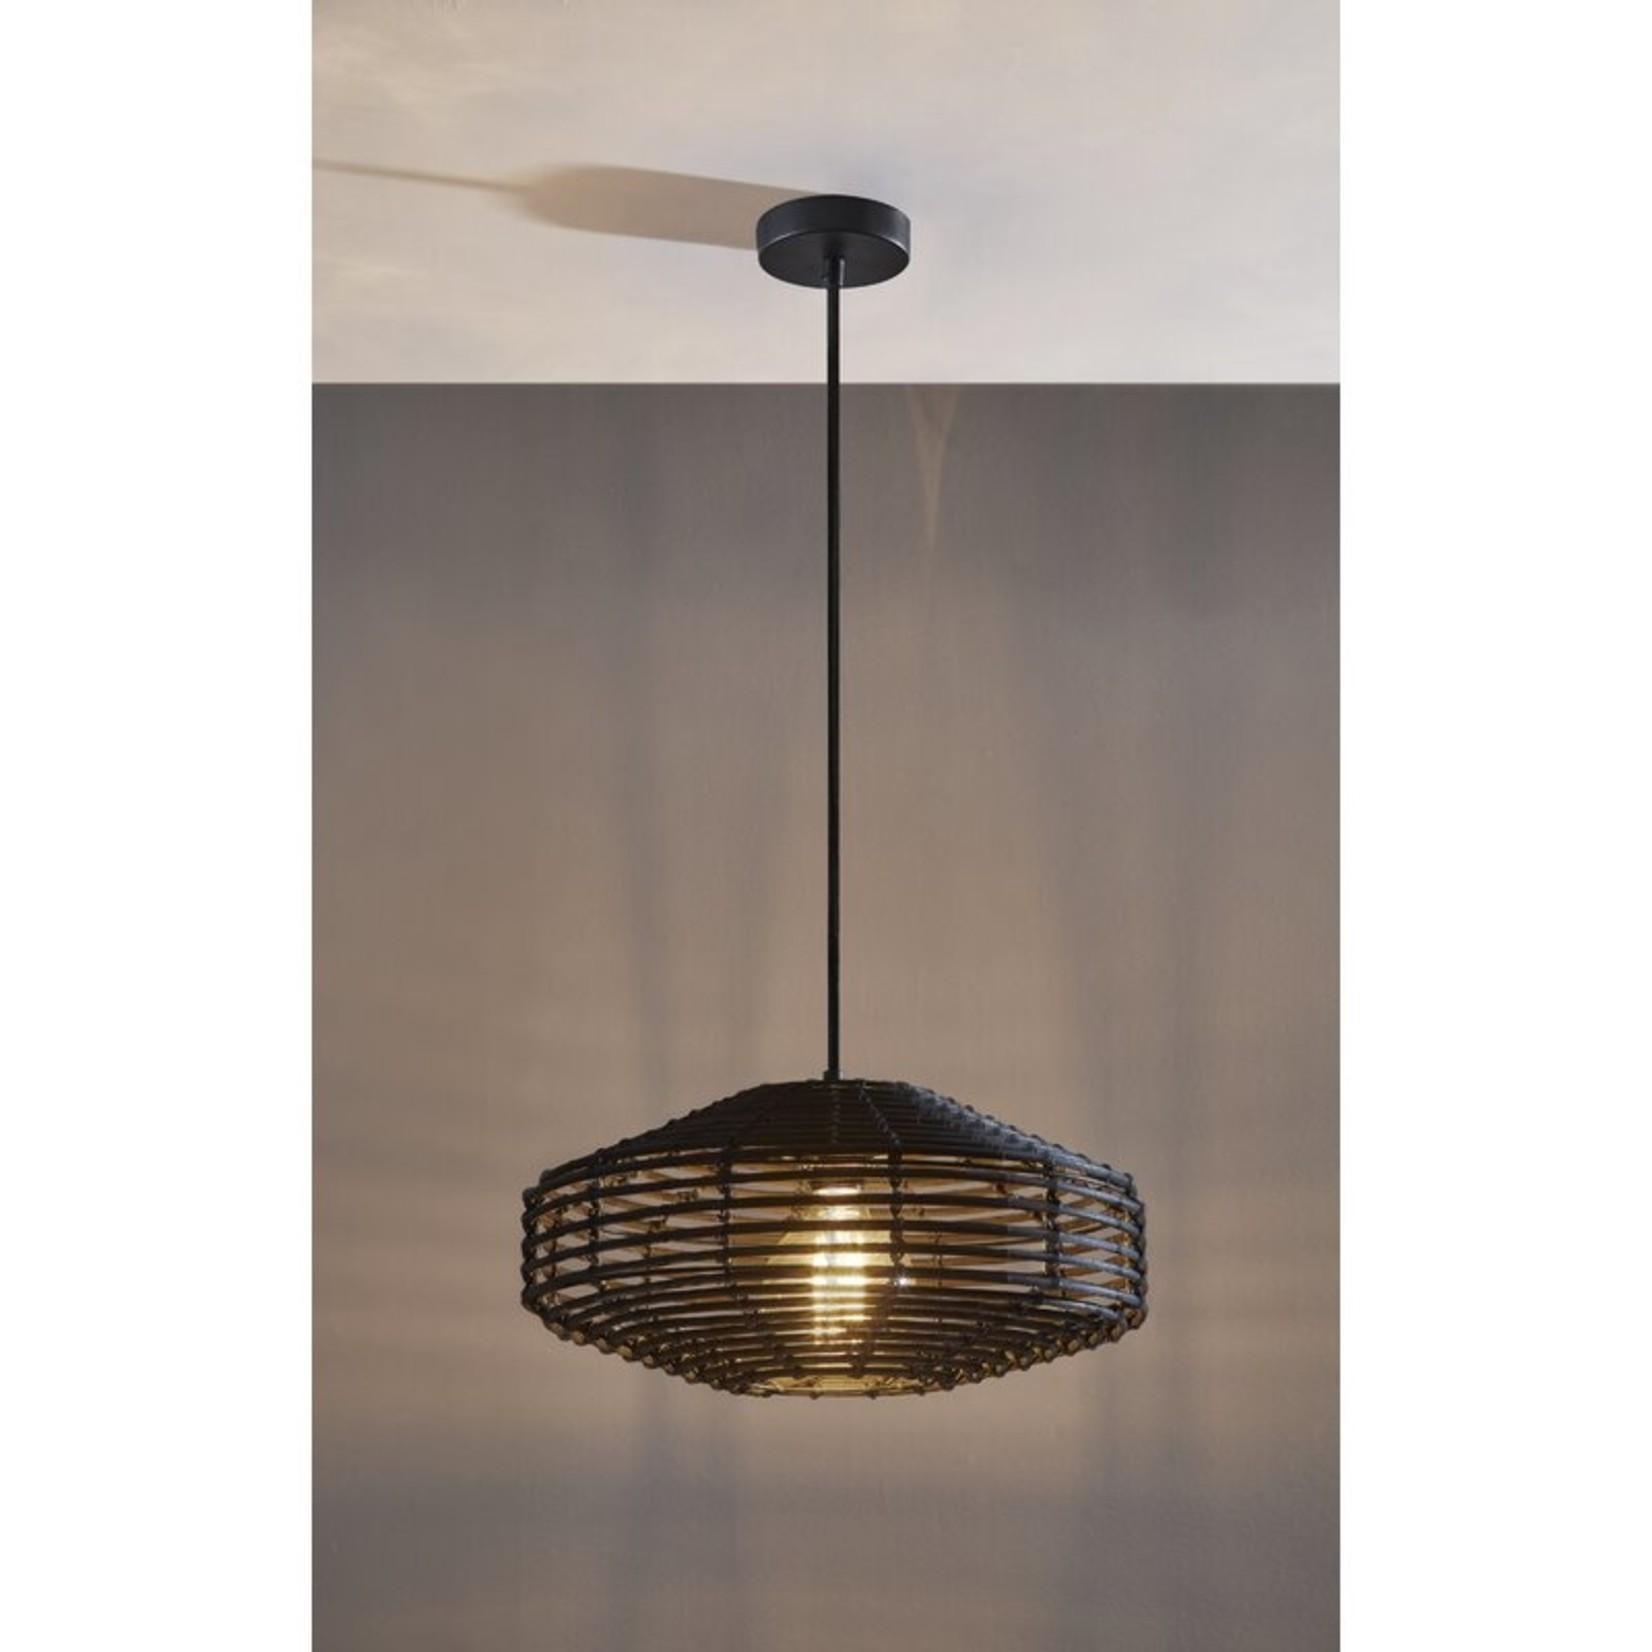 *Lostwithiel 1-Light Single Drum Pendant with Wood Accents - Black